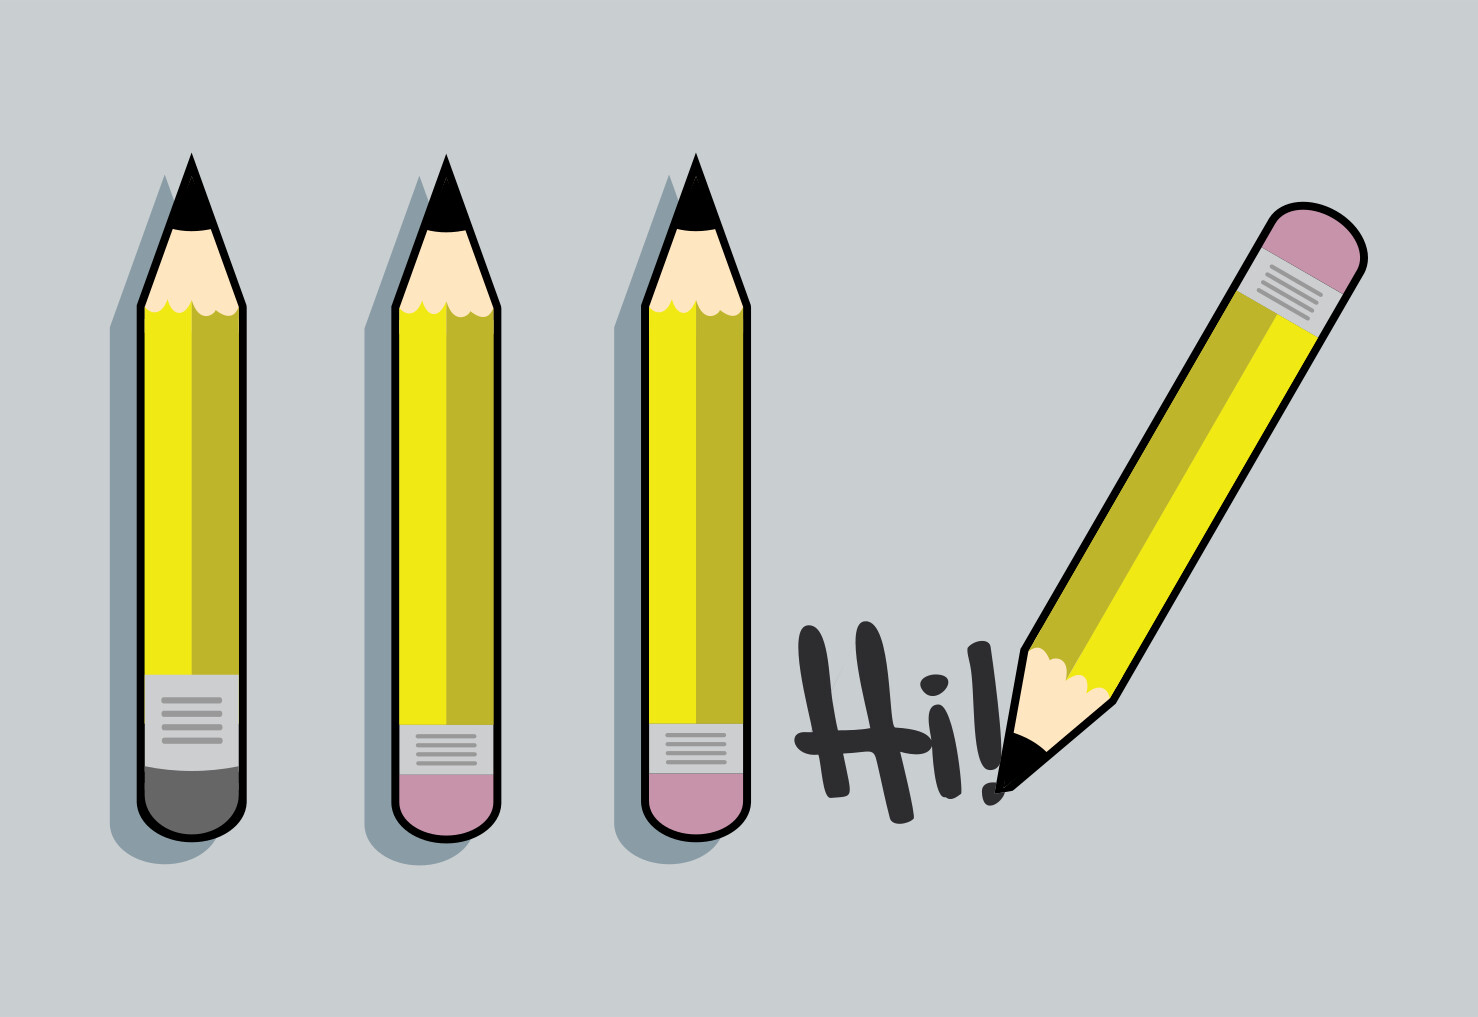 pencils   education  supplies  pencils  pencils 4  pencils pencil clip art svg pencil clip art svg